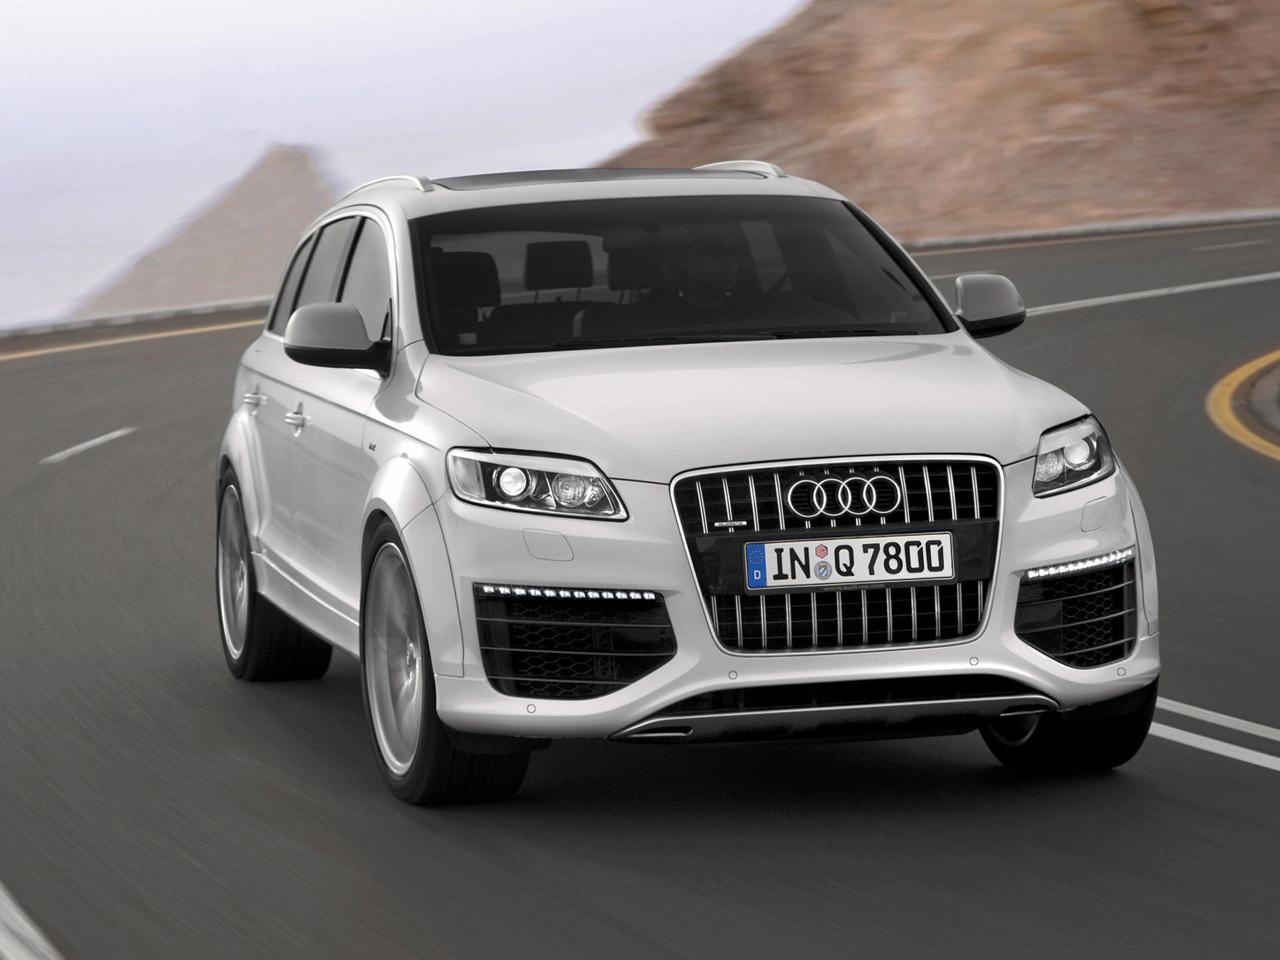 Audi Q7 vue avant